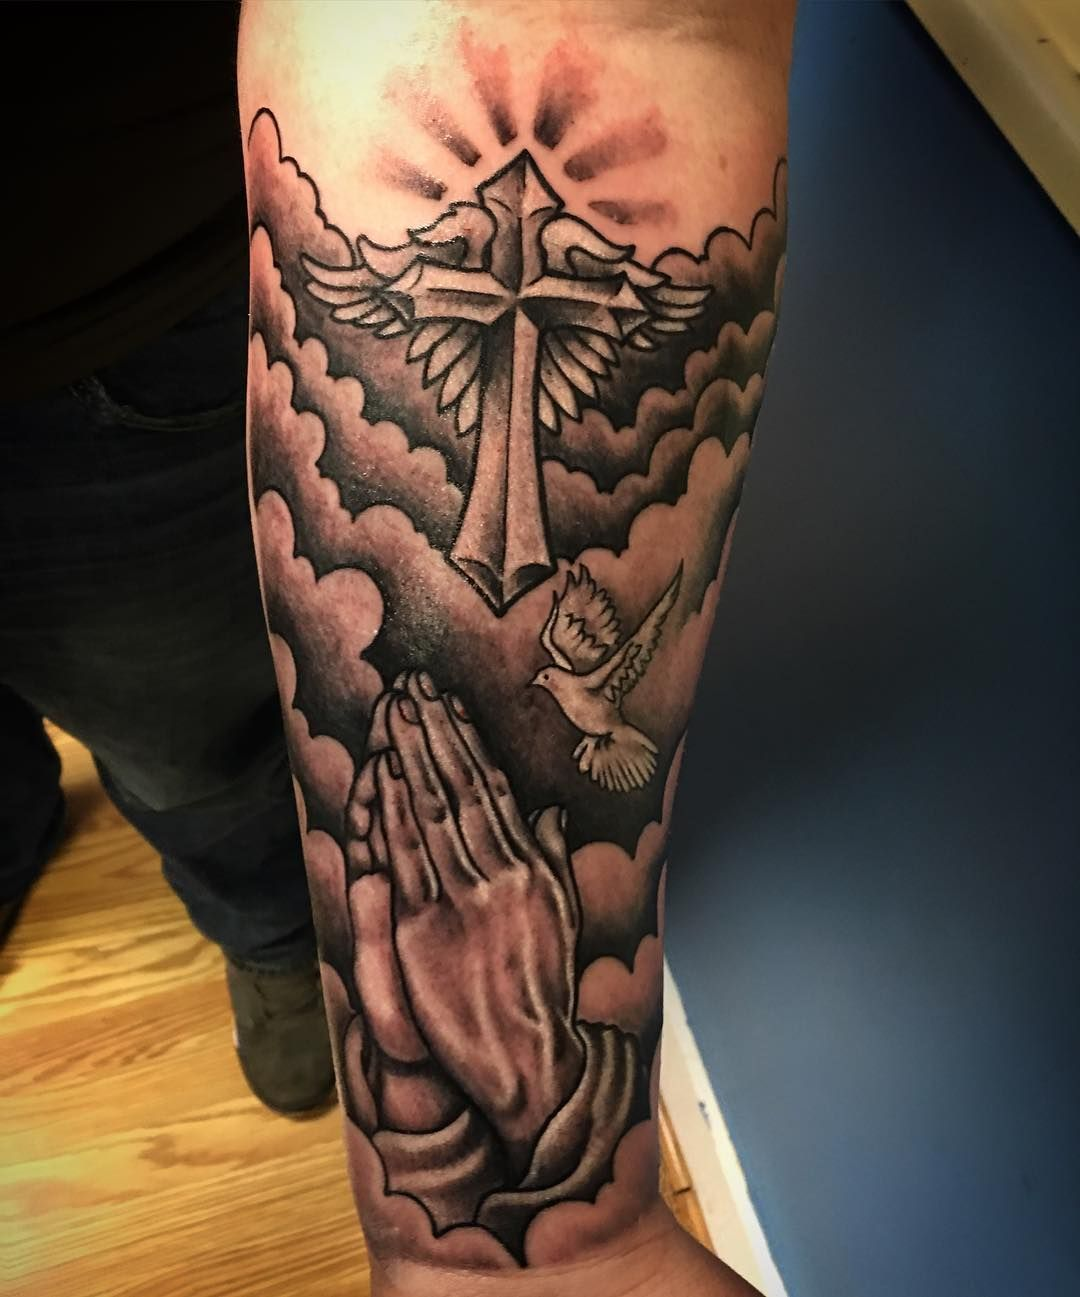 Masculine tattoos designs - Dove Tattoos